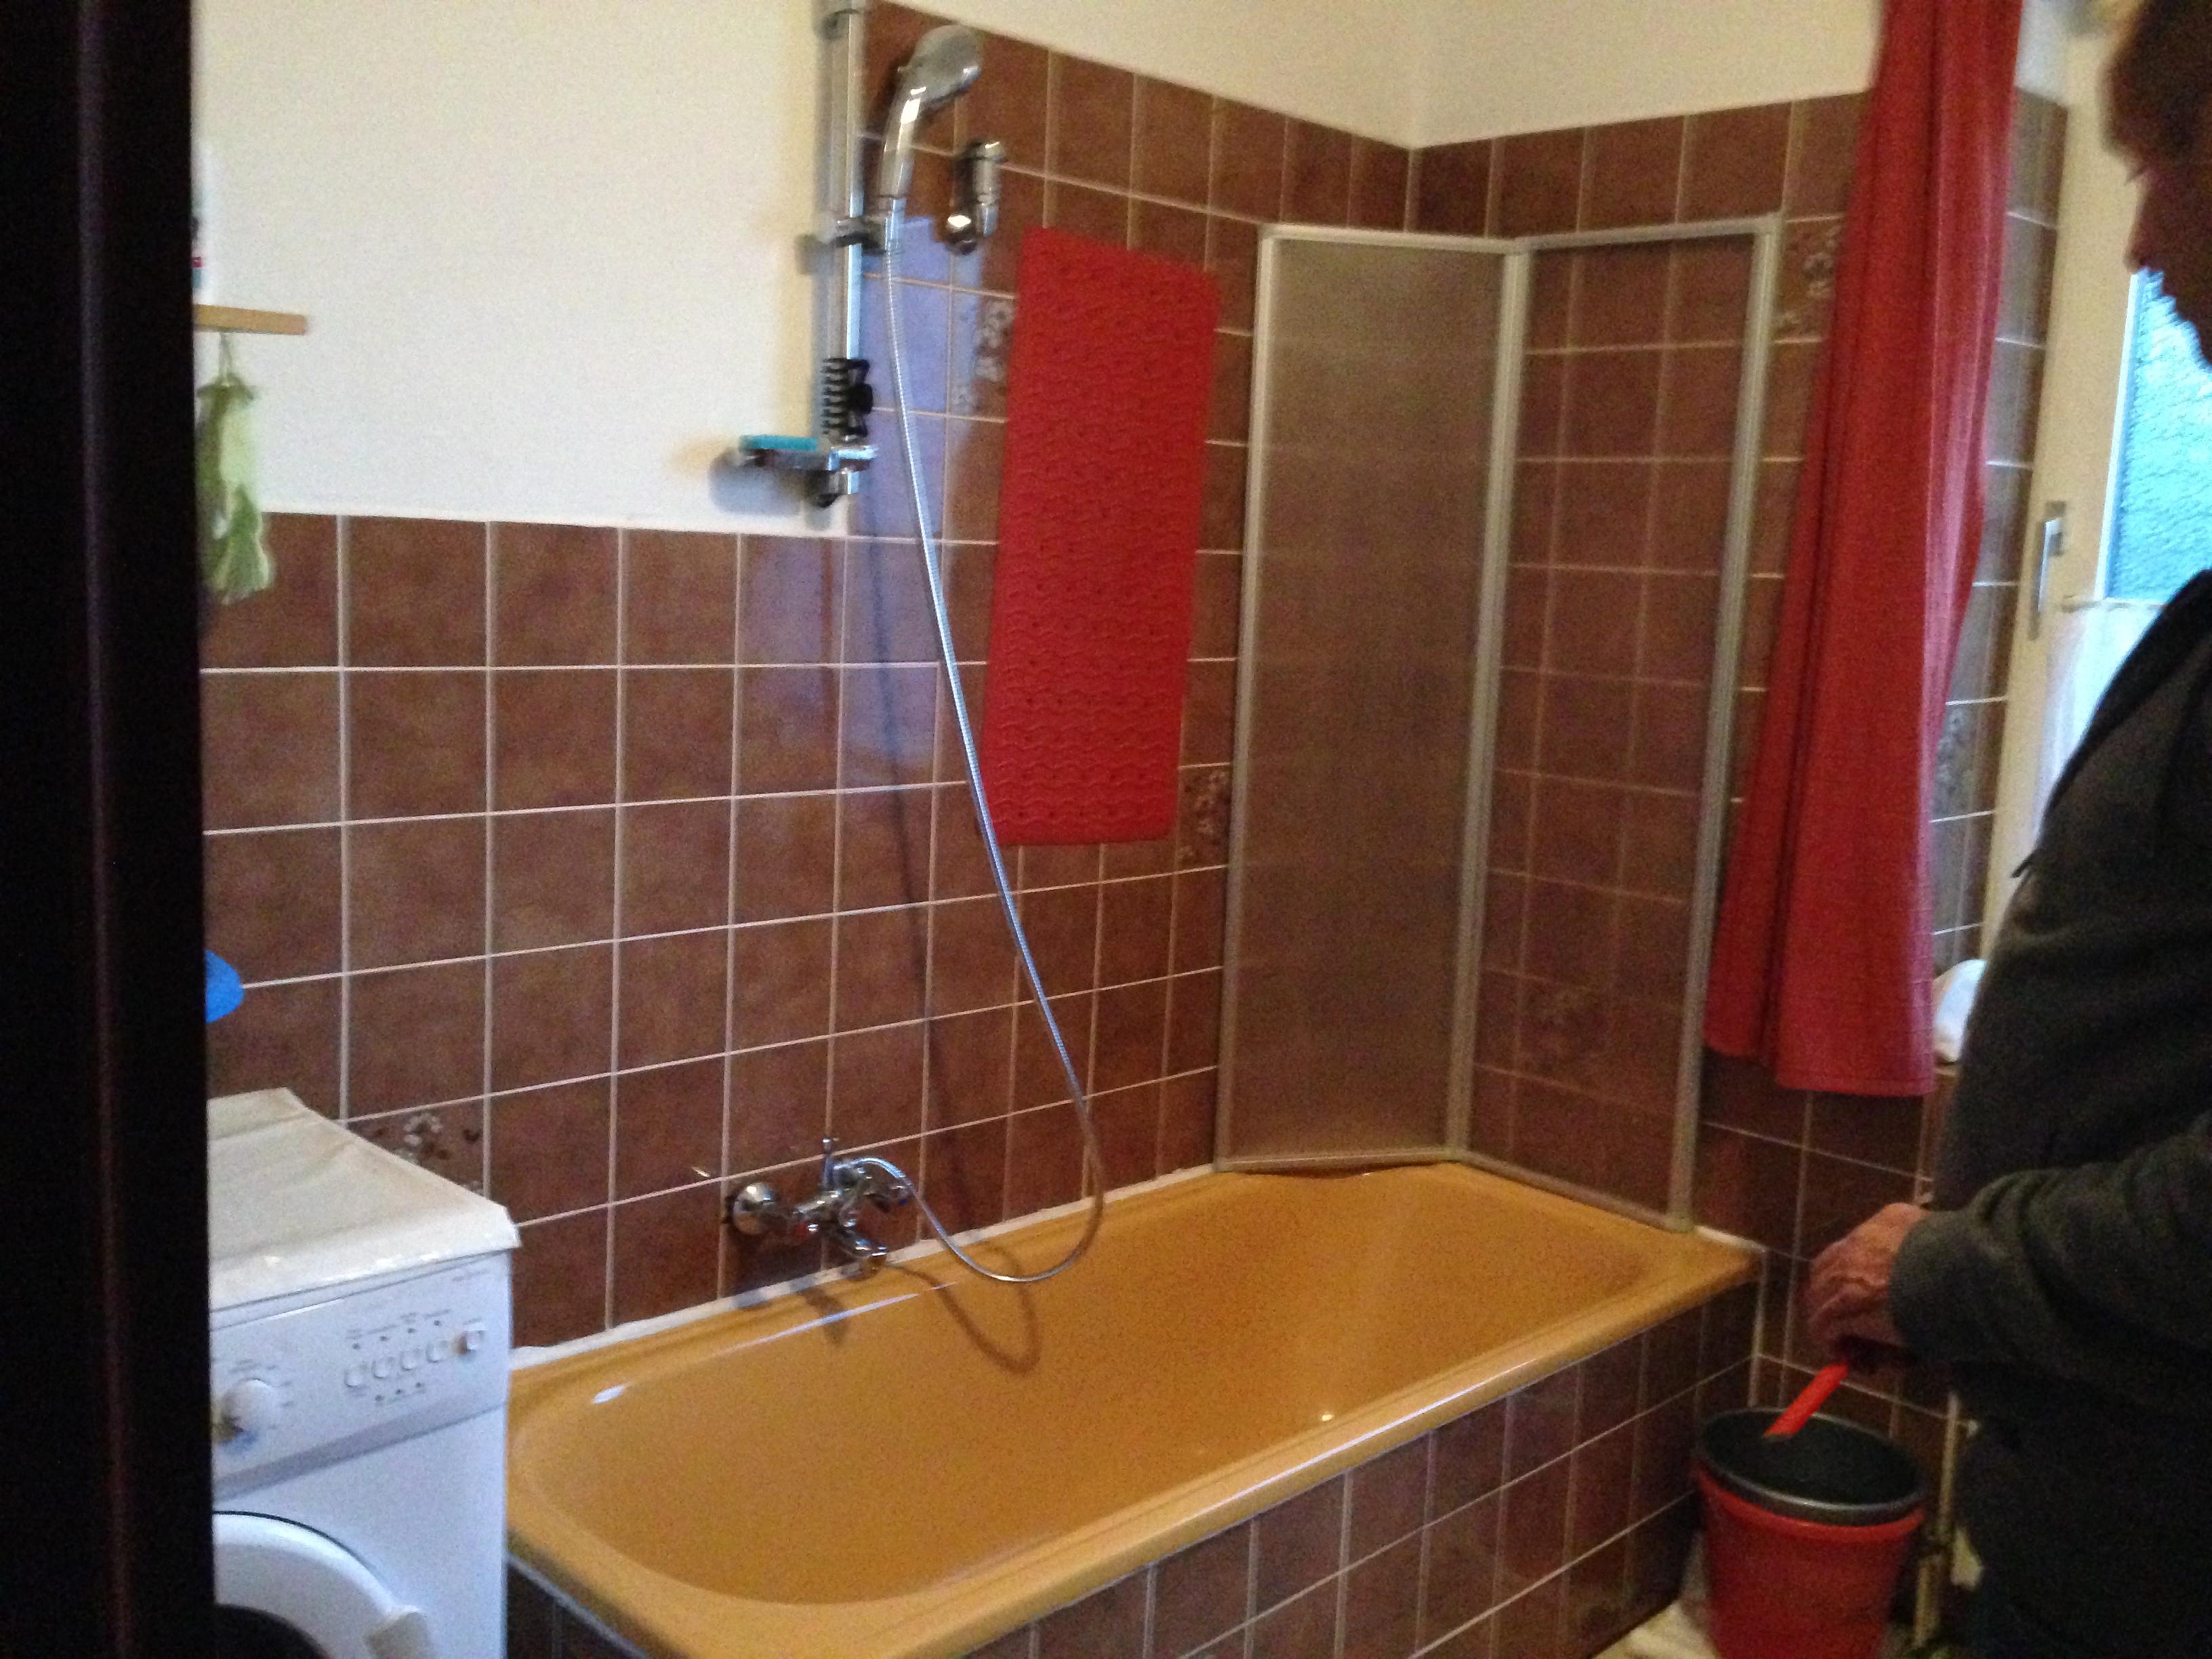 Hilfe! 80er Jahre Bad | Selbst.de DIY Forum